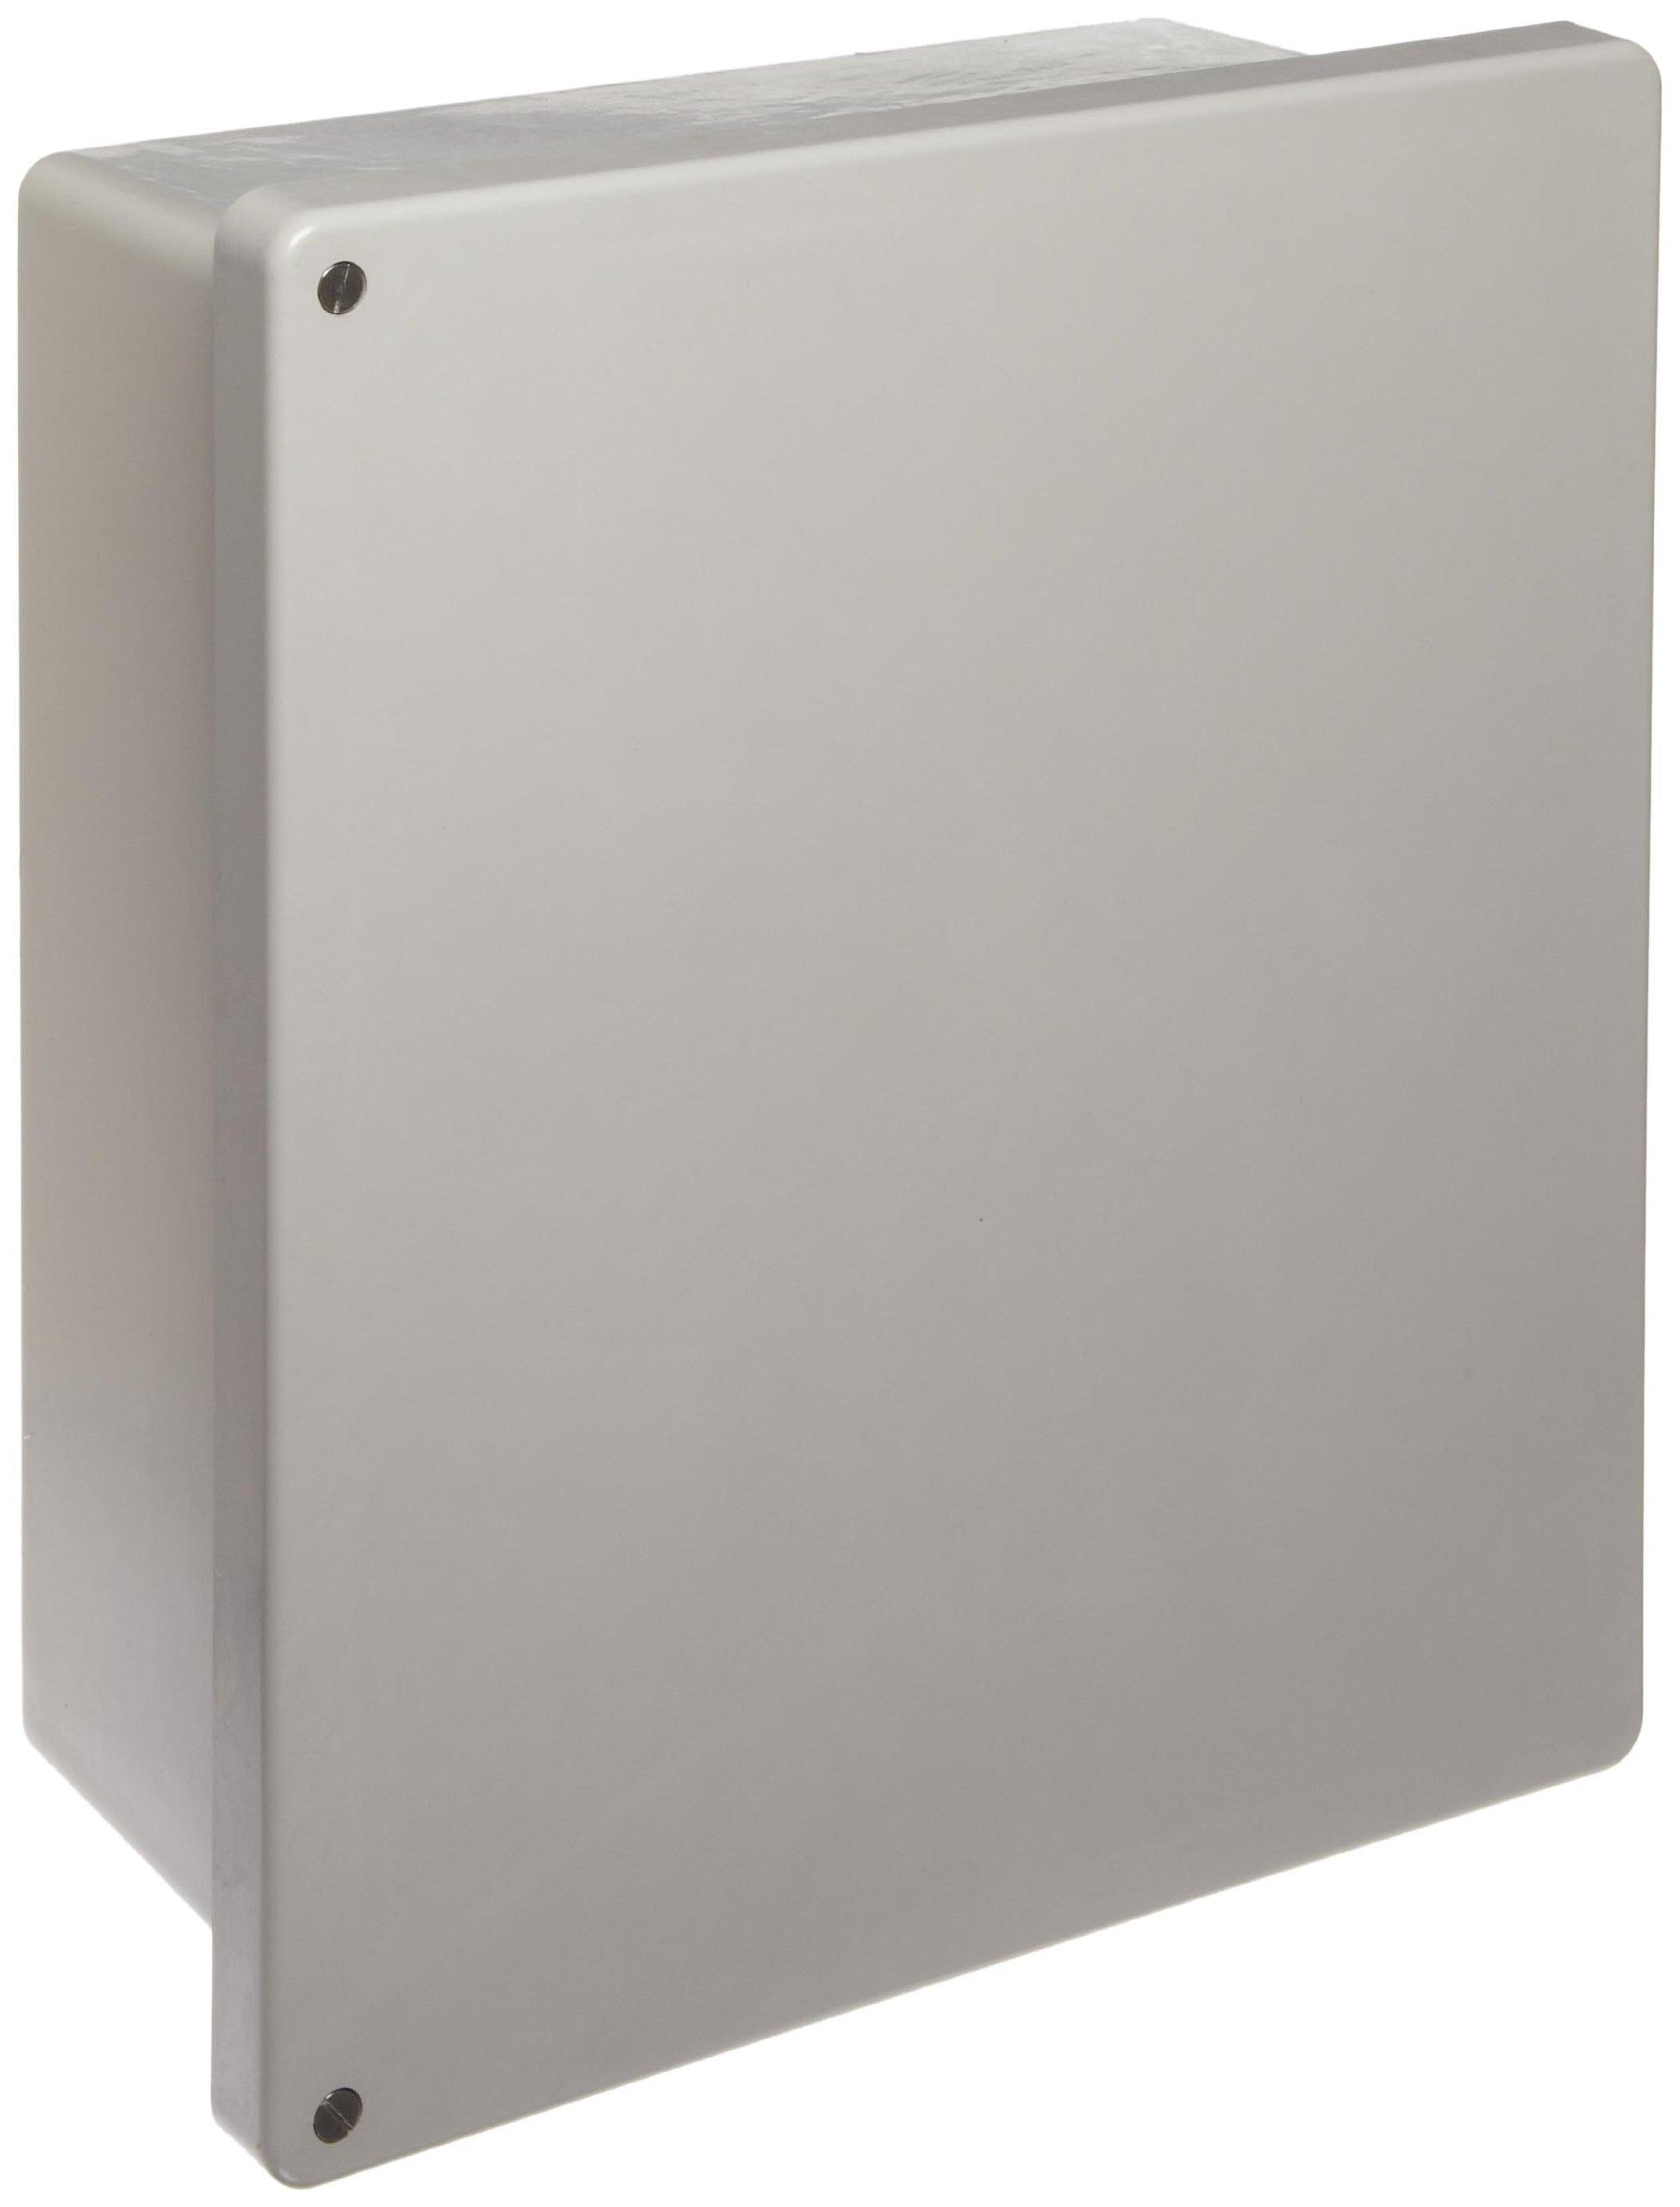 BUD Industries NF-6614 Fiberglass NEMA Box with Screwed Cover, 13-57/64'' Width x 15-49/64'' Height x 6-51/64'' Depth, Light Gray Finish